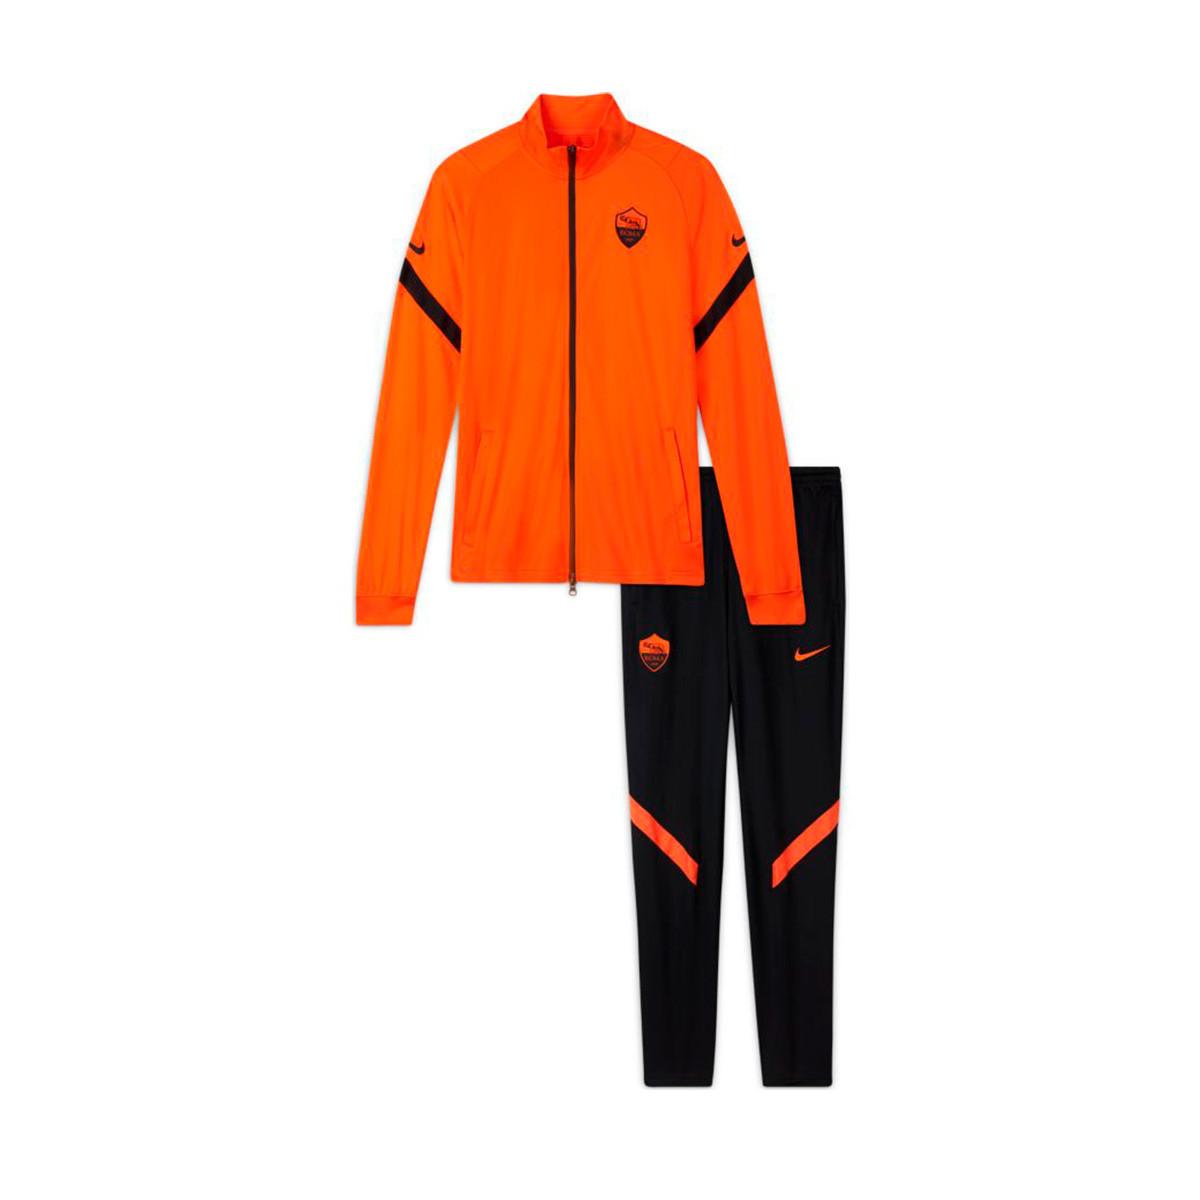 cerrar Maestría Cien años  Chándal Nike AS Roma Strike K CL 2020-2021 Safety orange-Black - Tienda de  fútbol Fútbol Emotion